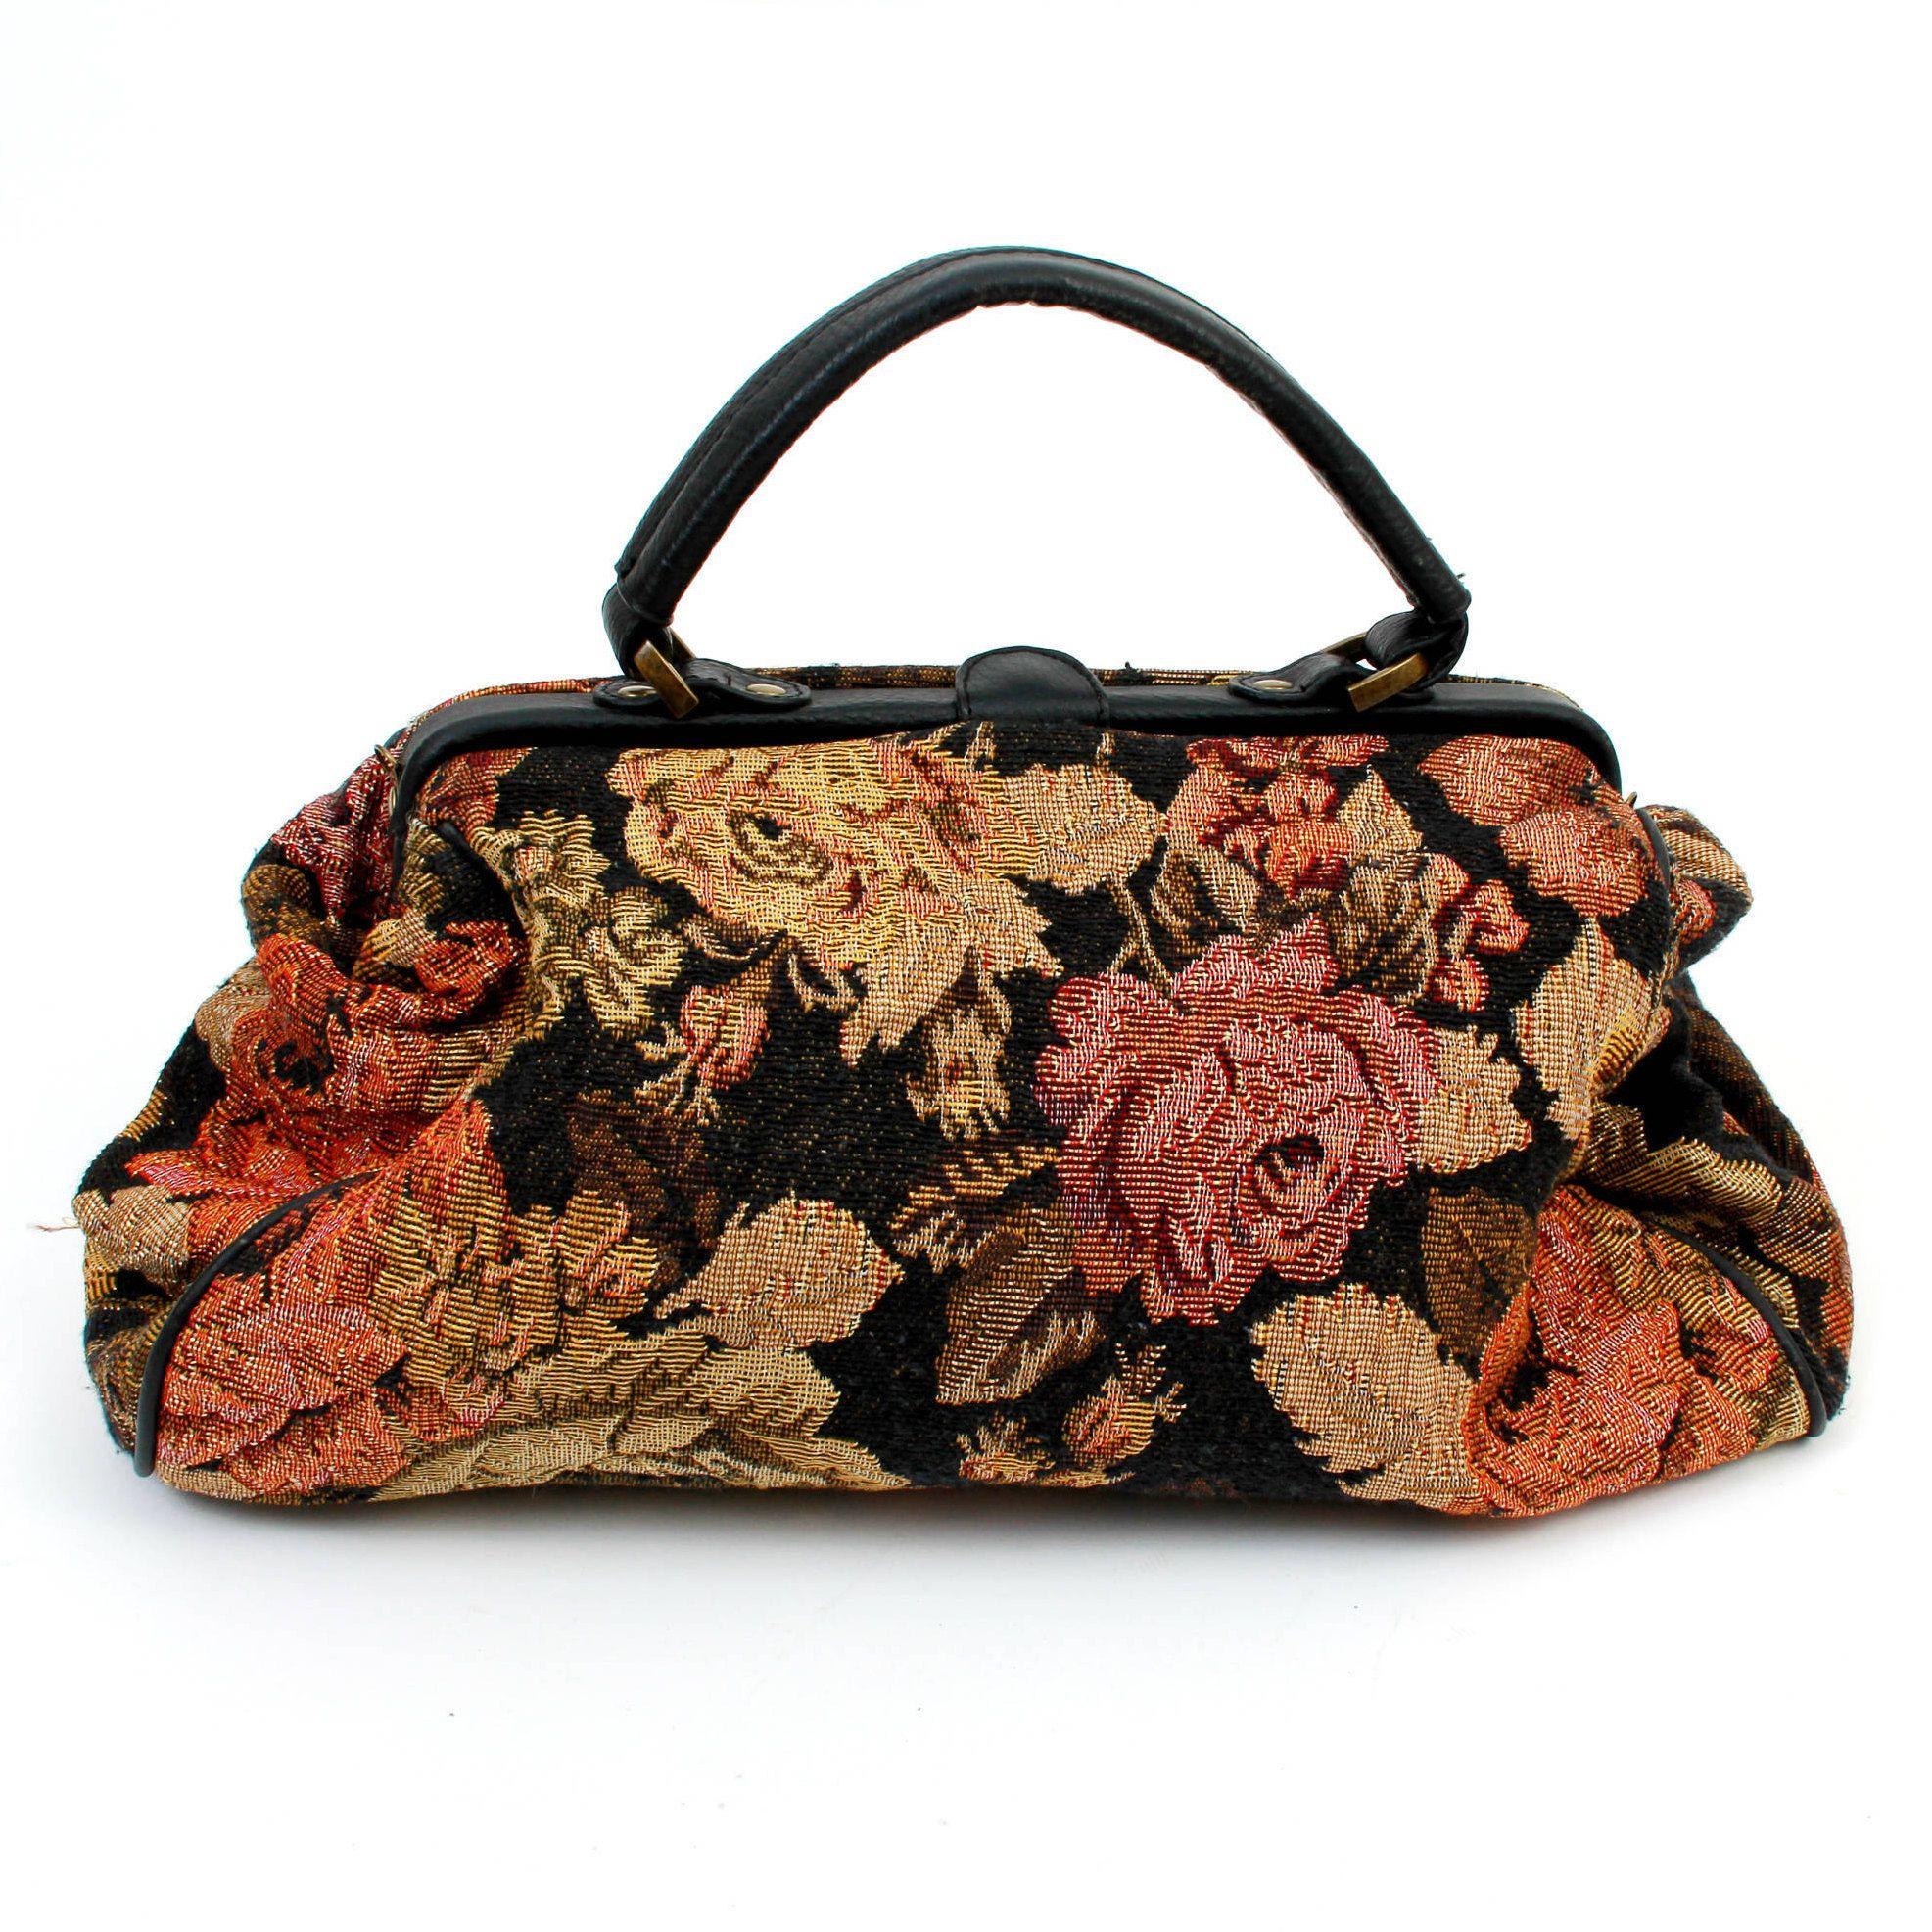 Vintage Tapestry Purse Fl Bag Retro Carpet Granny Handbag Boho By Ramaci On Etsy